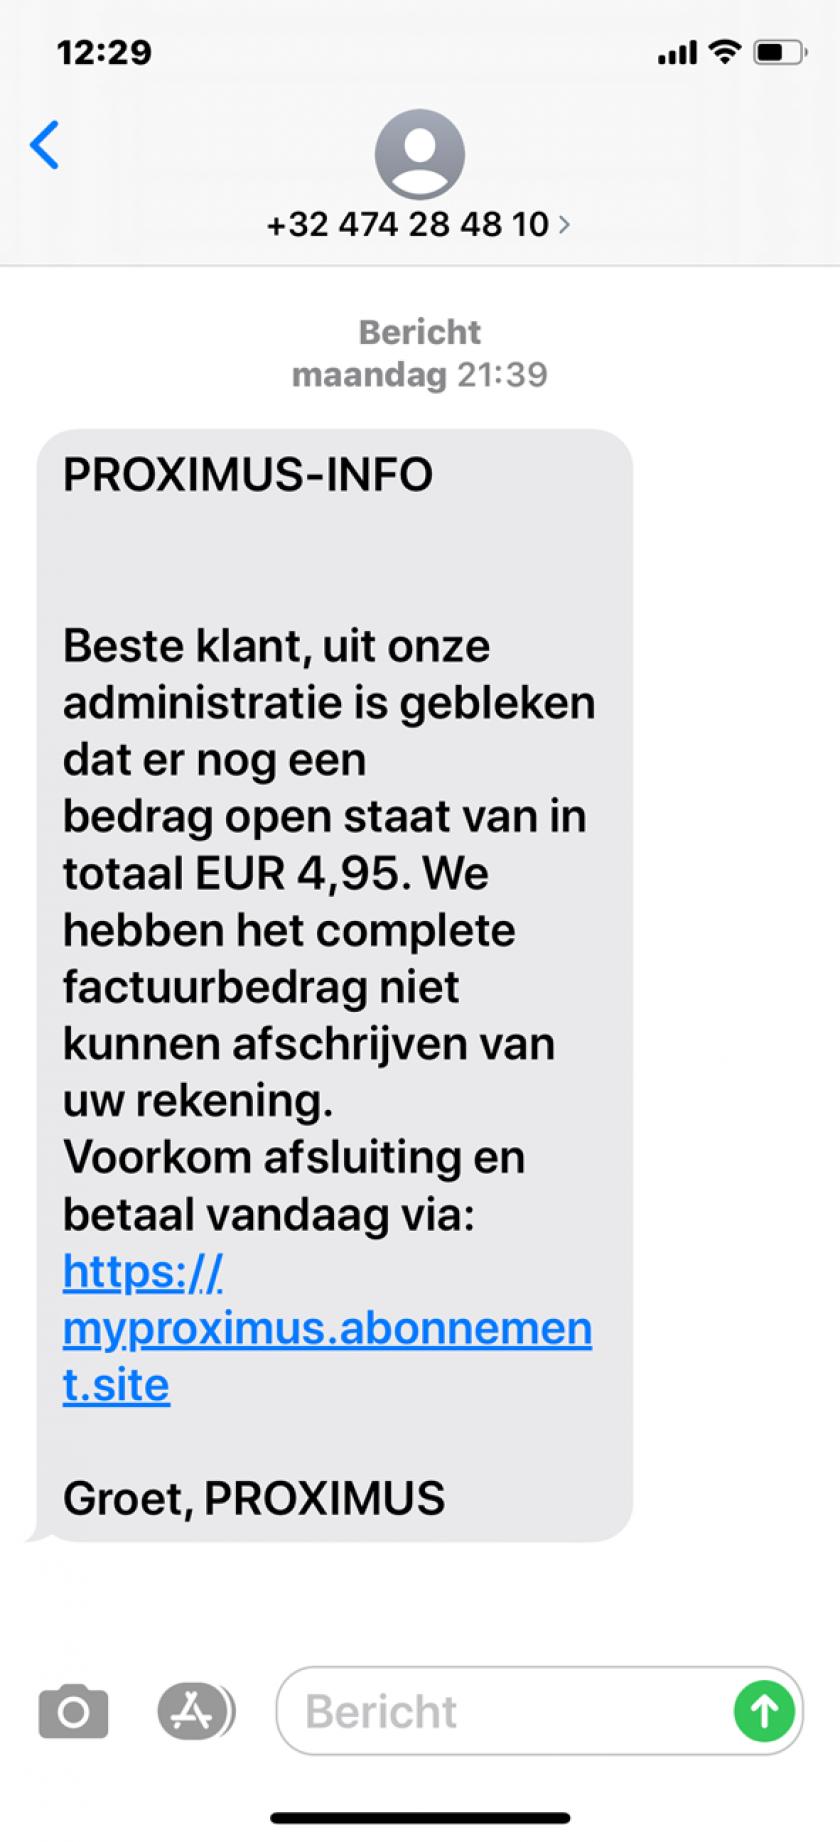 Frauduleus sms-bericht